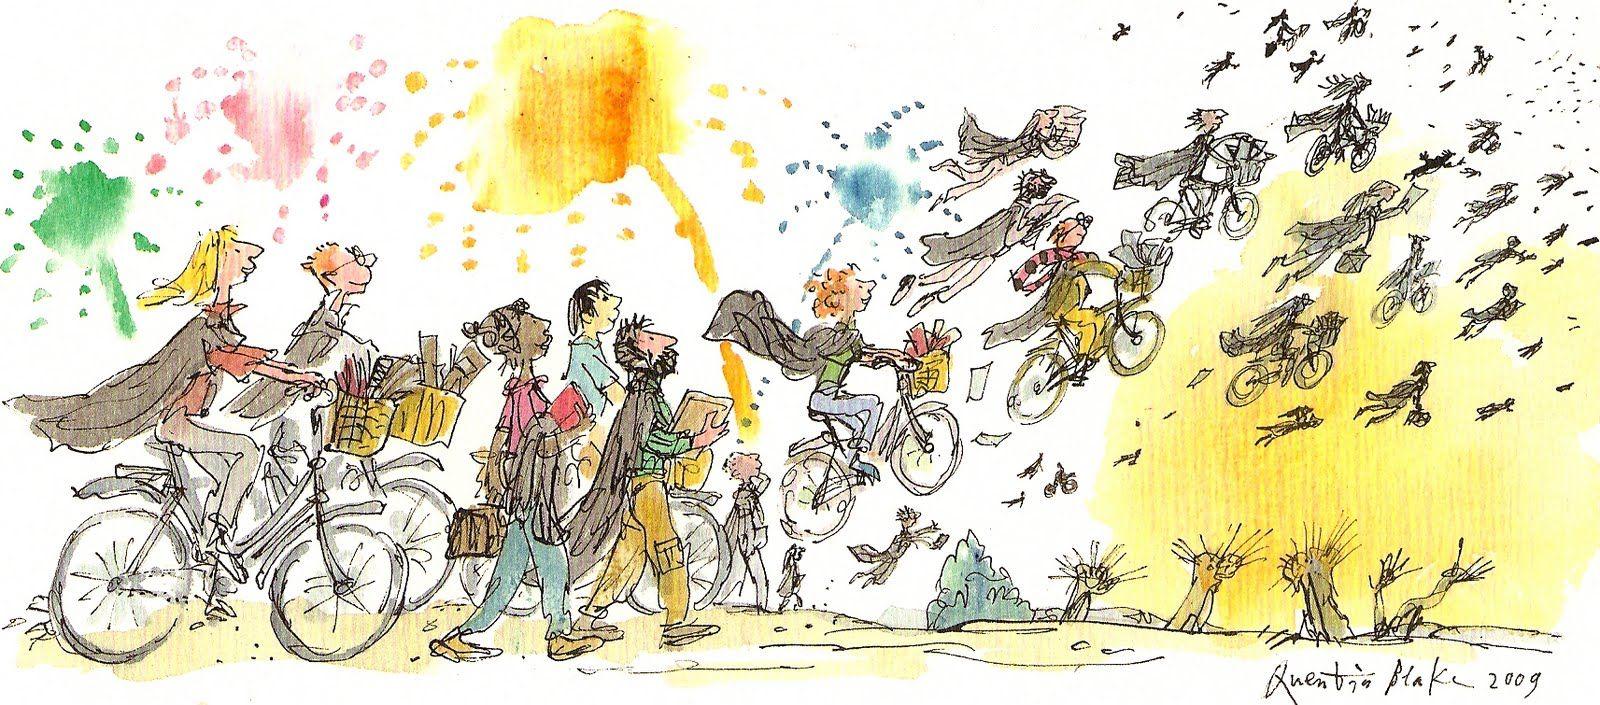 Dibujos Bonitos: Quentin Blake   Quentin blake